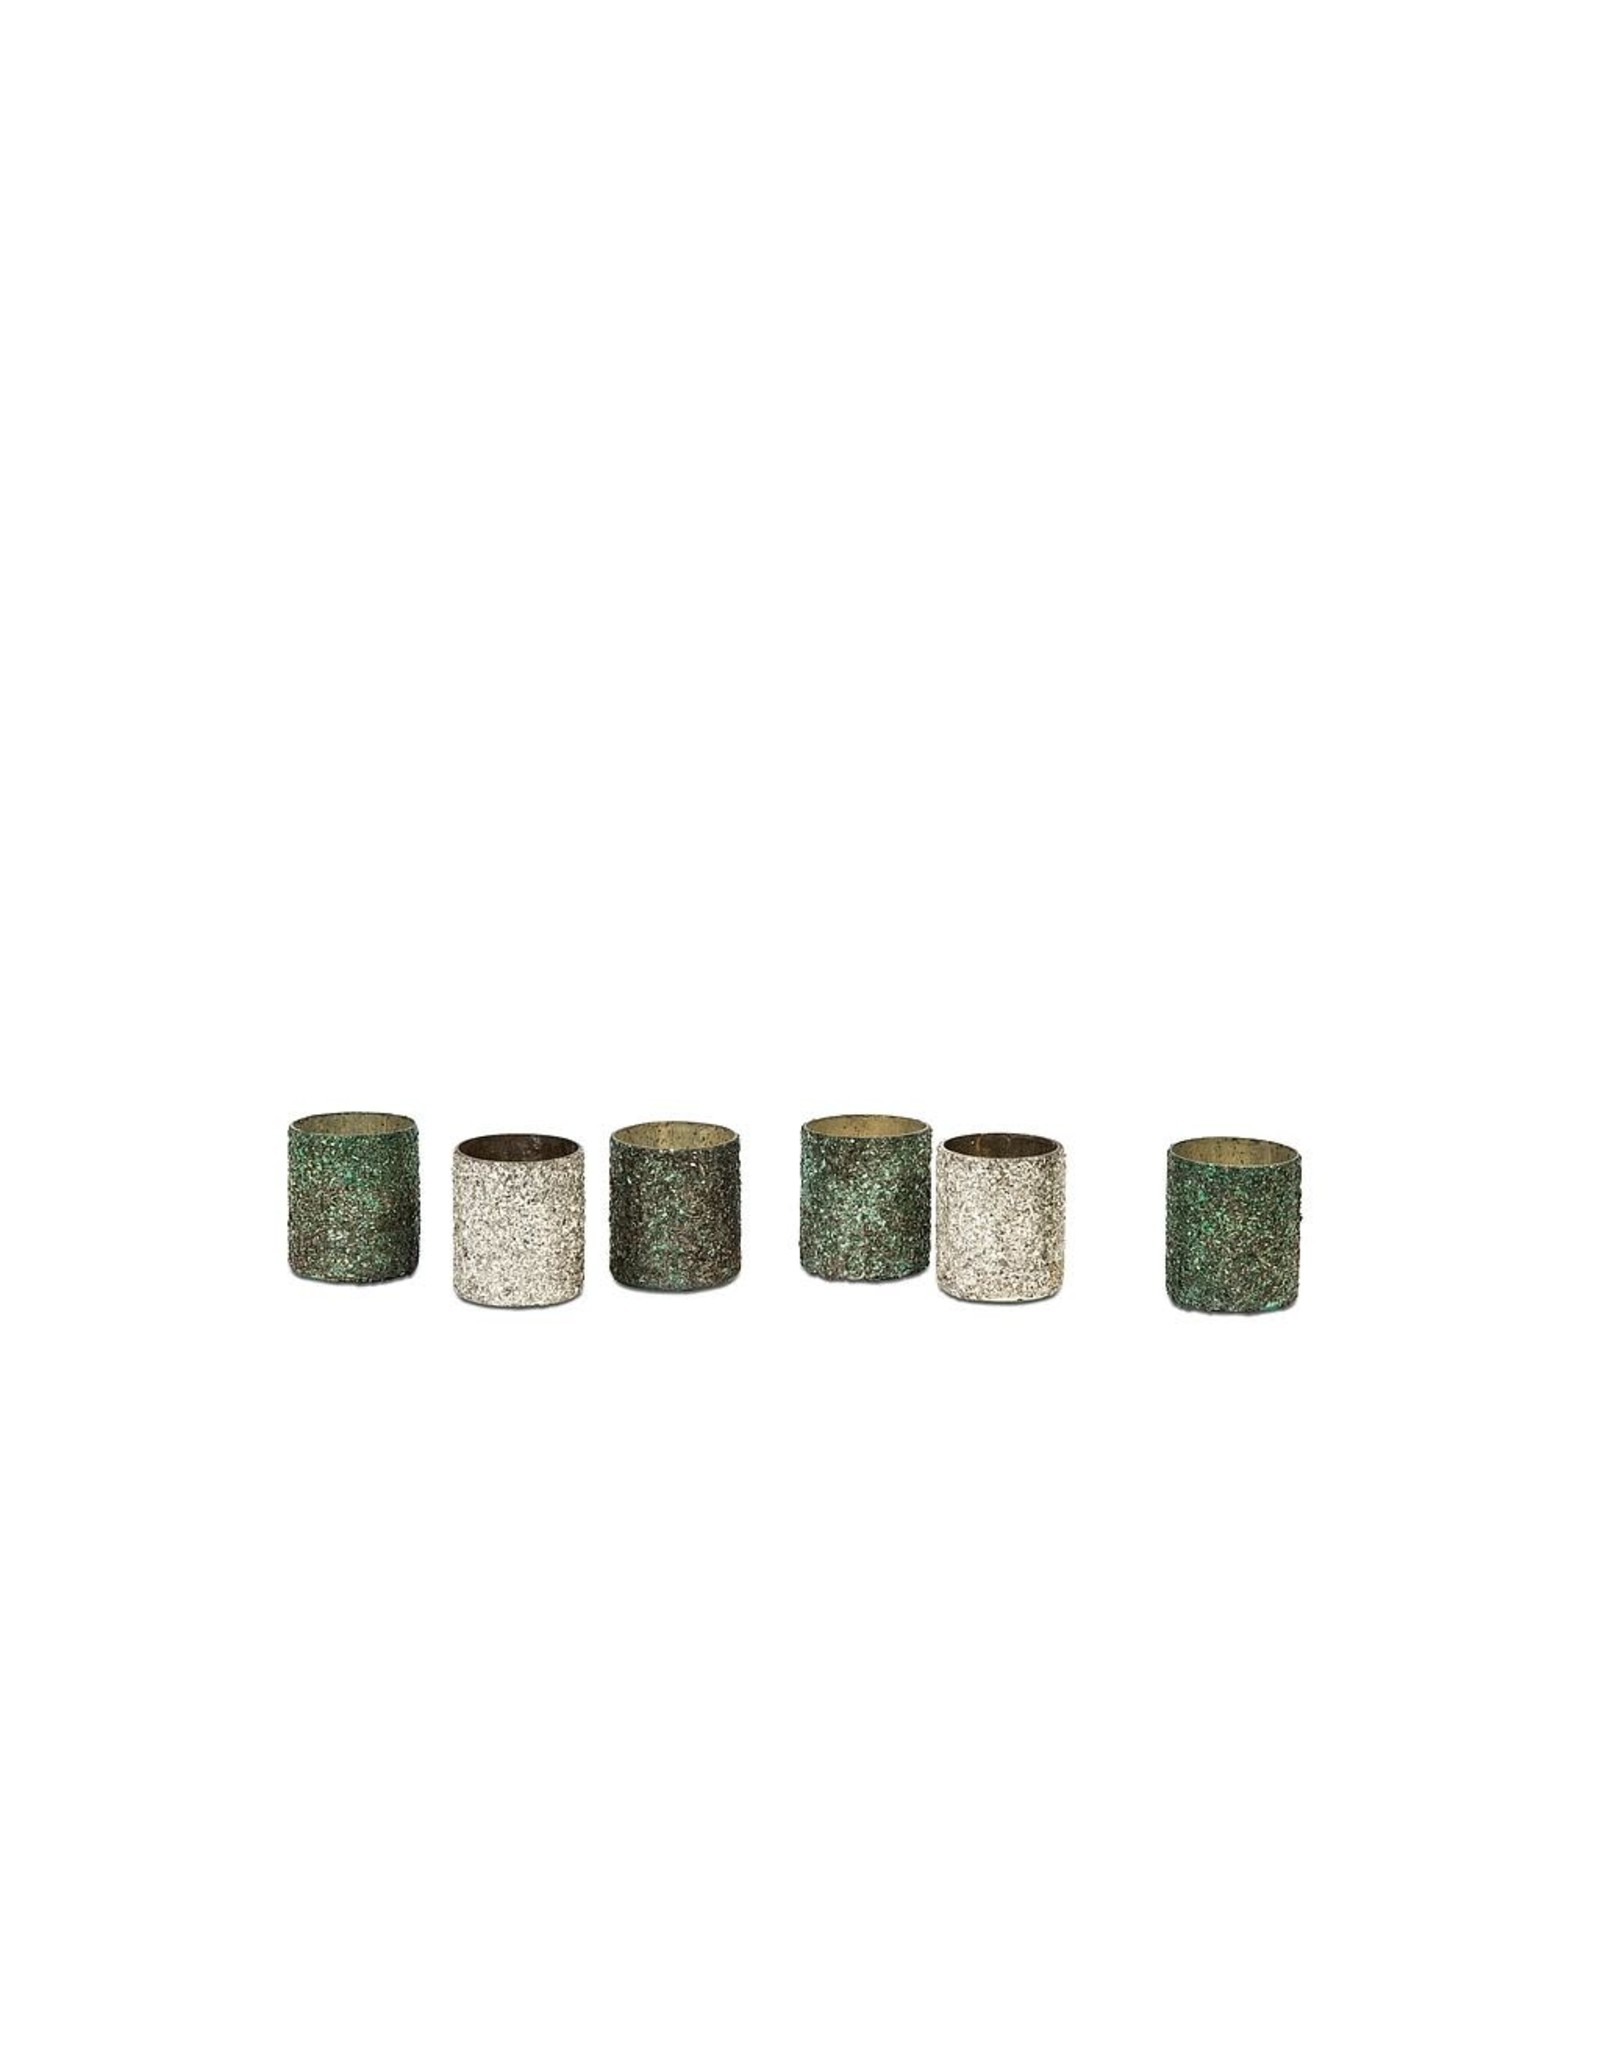 Dekocandle Tlight Flake Mosaic - Glass - Silver- 7x8cm